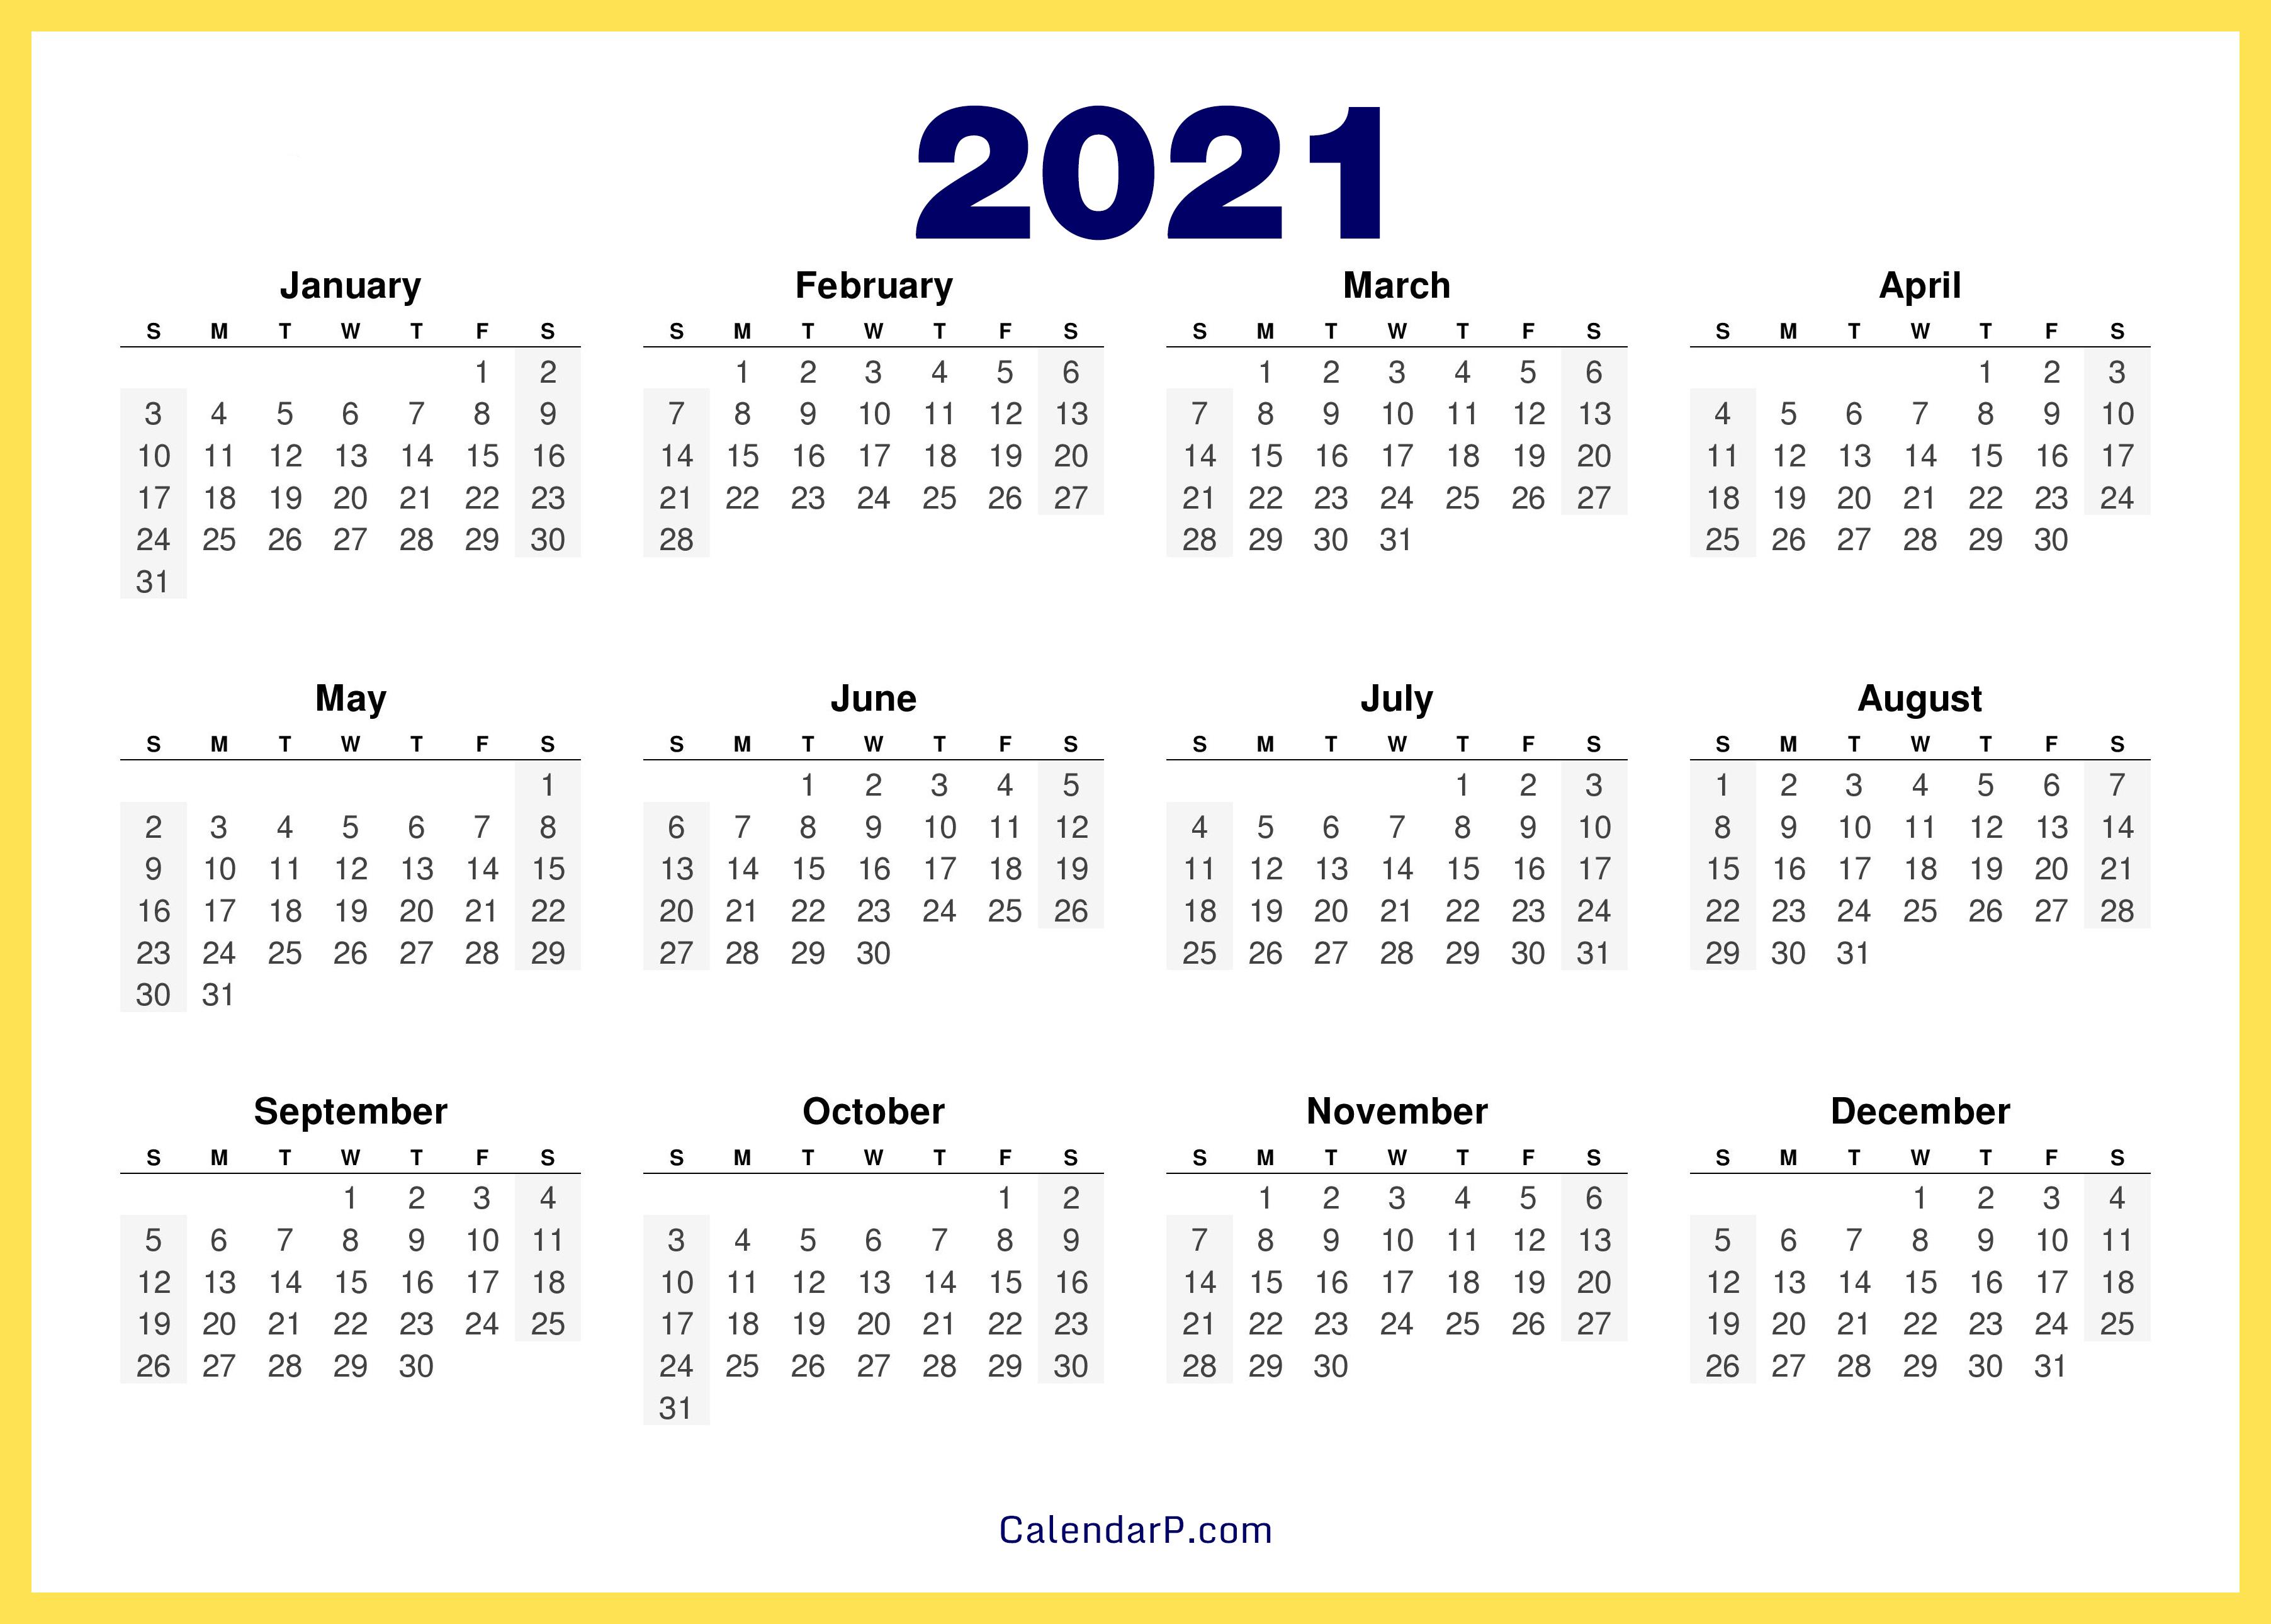 2021 Calendar Printable Free, HD - Yellow - CalendarP ...